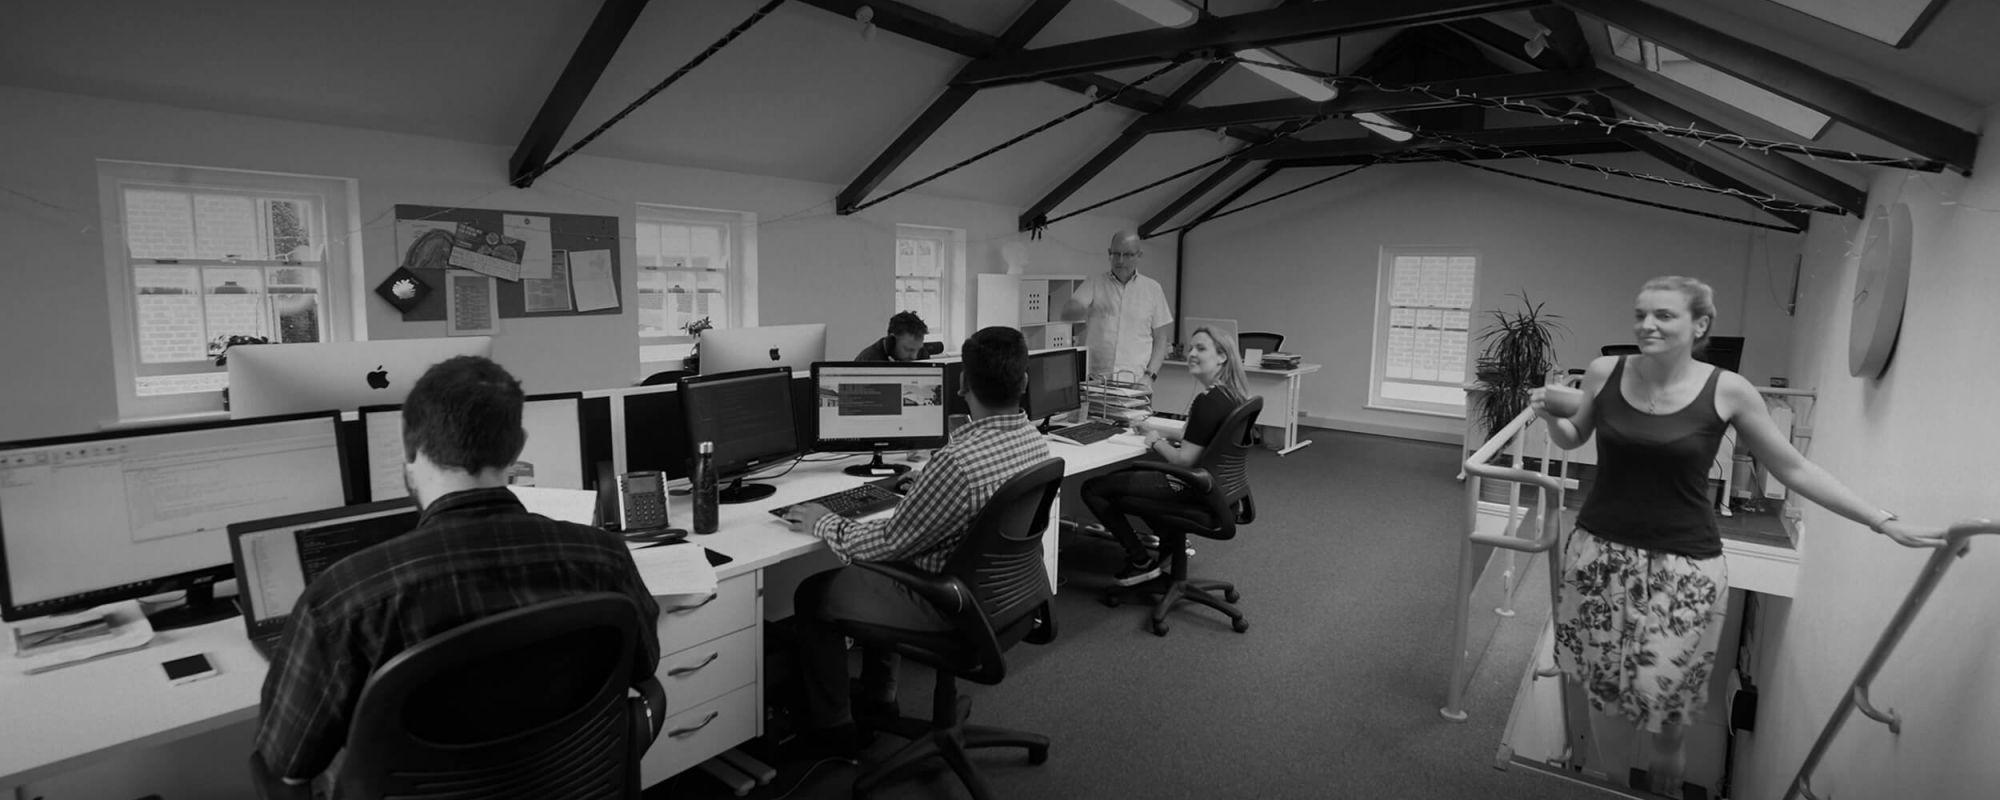 ib3 Office